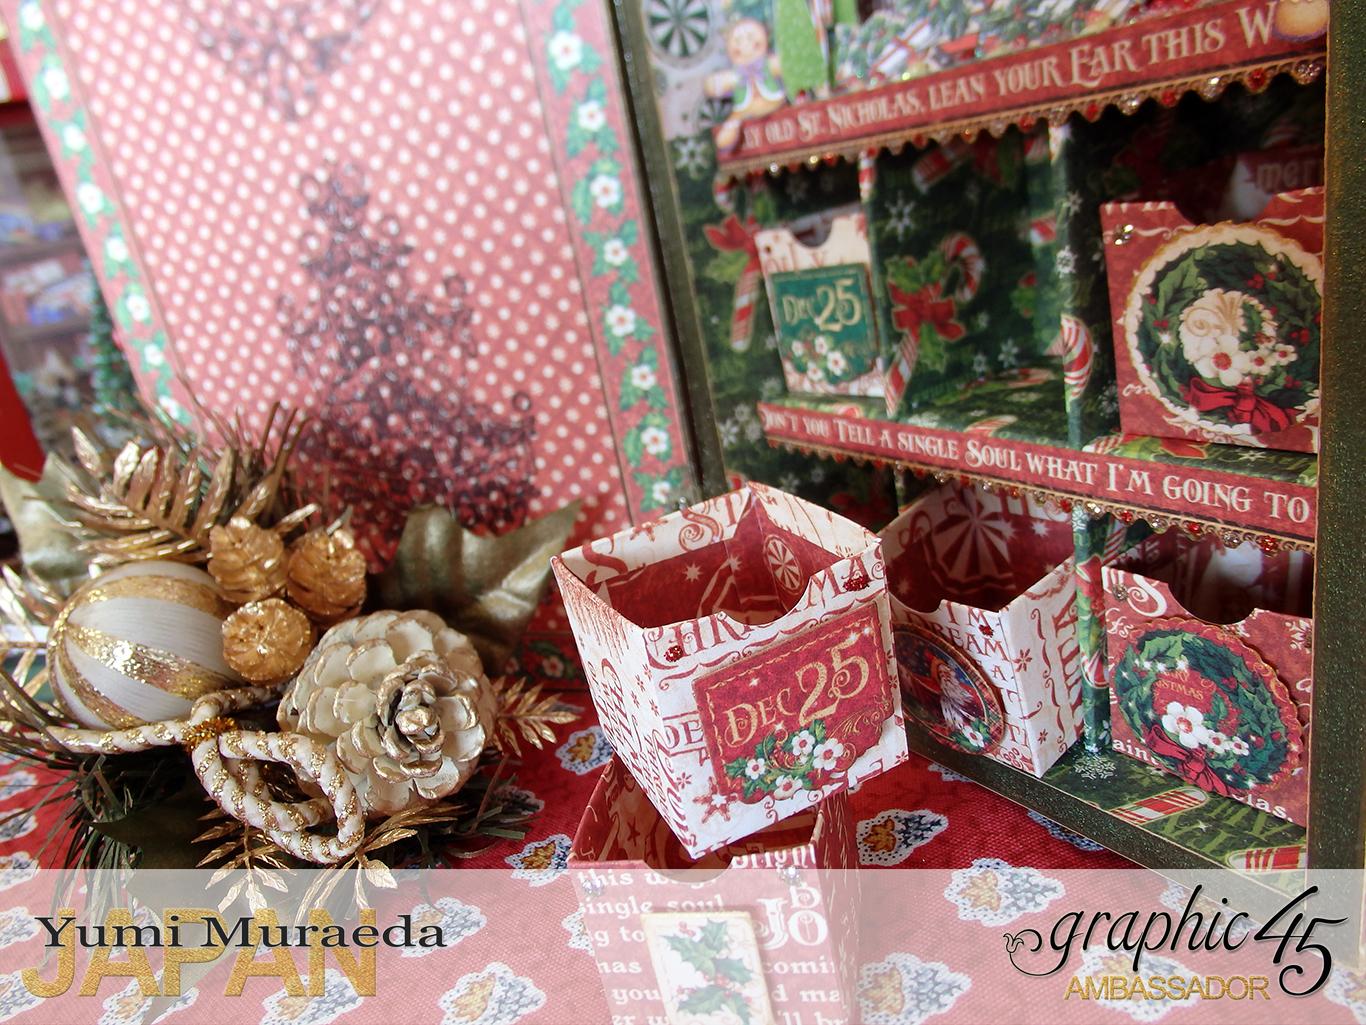 yuyu3xmasboxdesignbyyumimuraedaproductbygraphic45photo15jpg.jpg